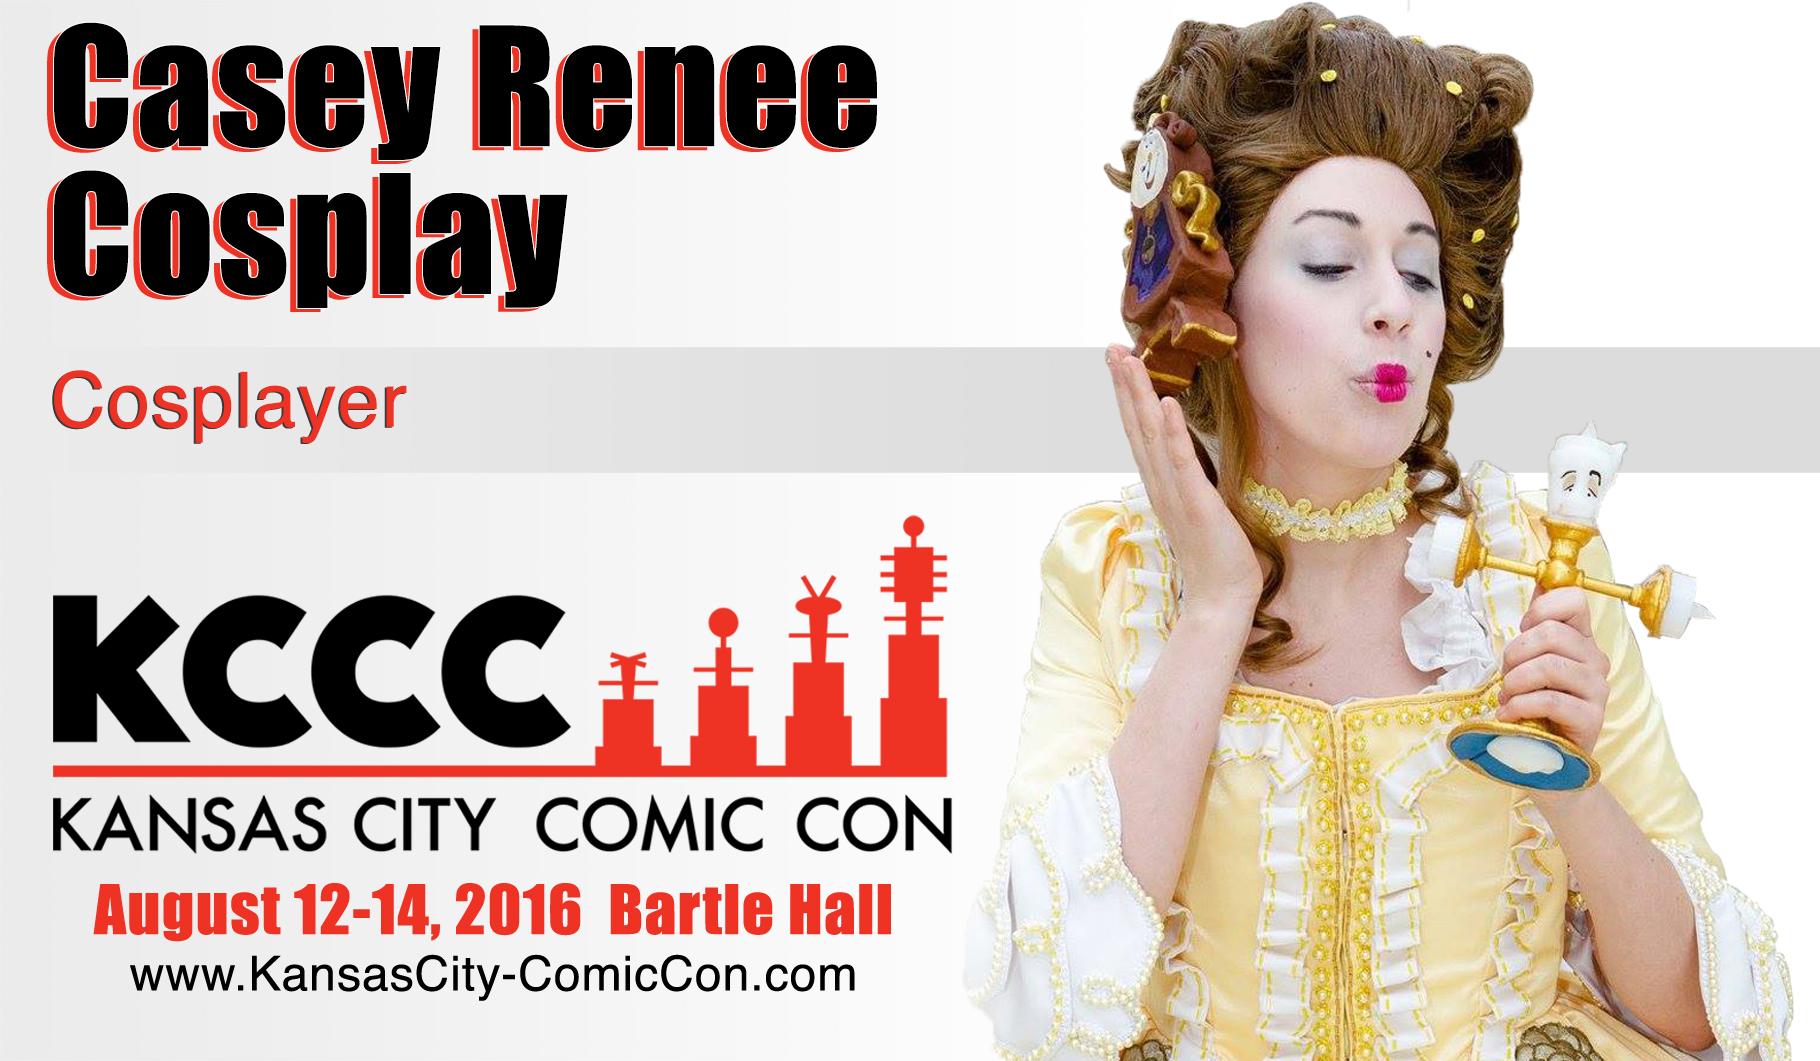 KCCC_Casey-Renee-Cosplay.jpg